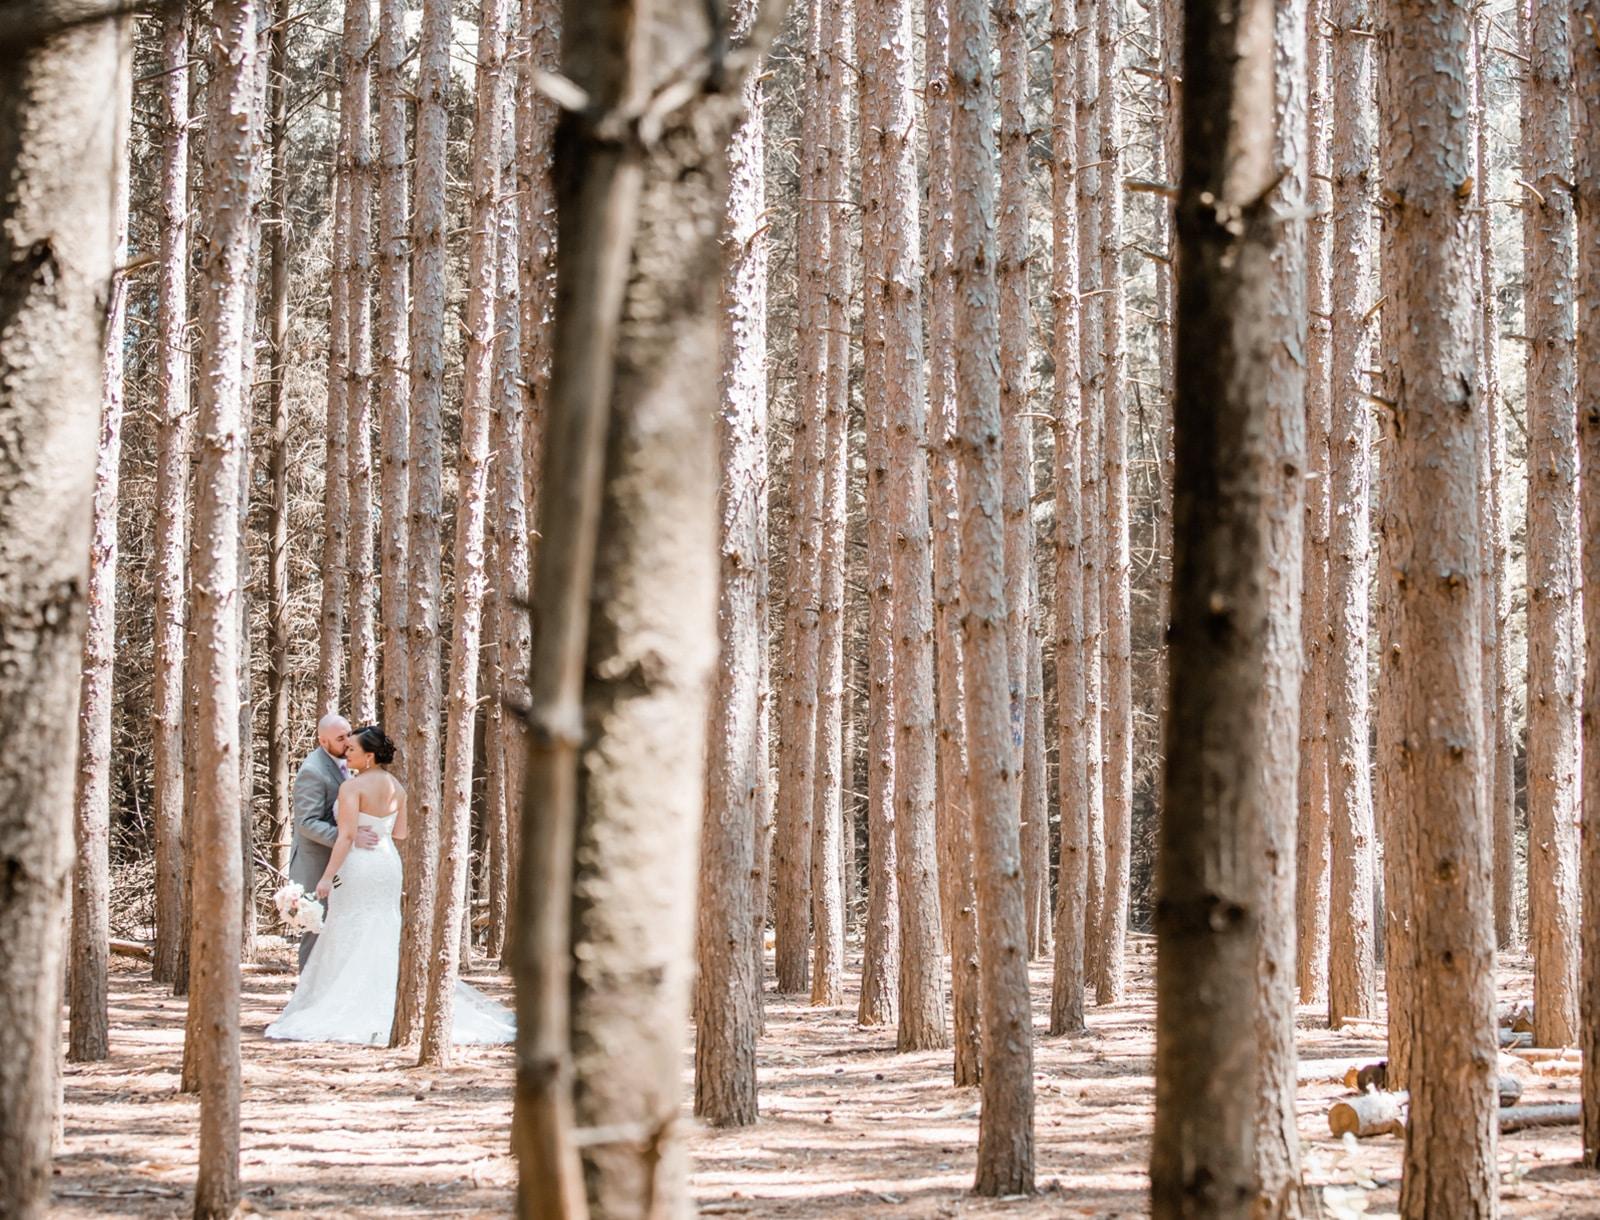 Toronto Venetian Wedding Photos: Samantha + Louchlyn